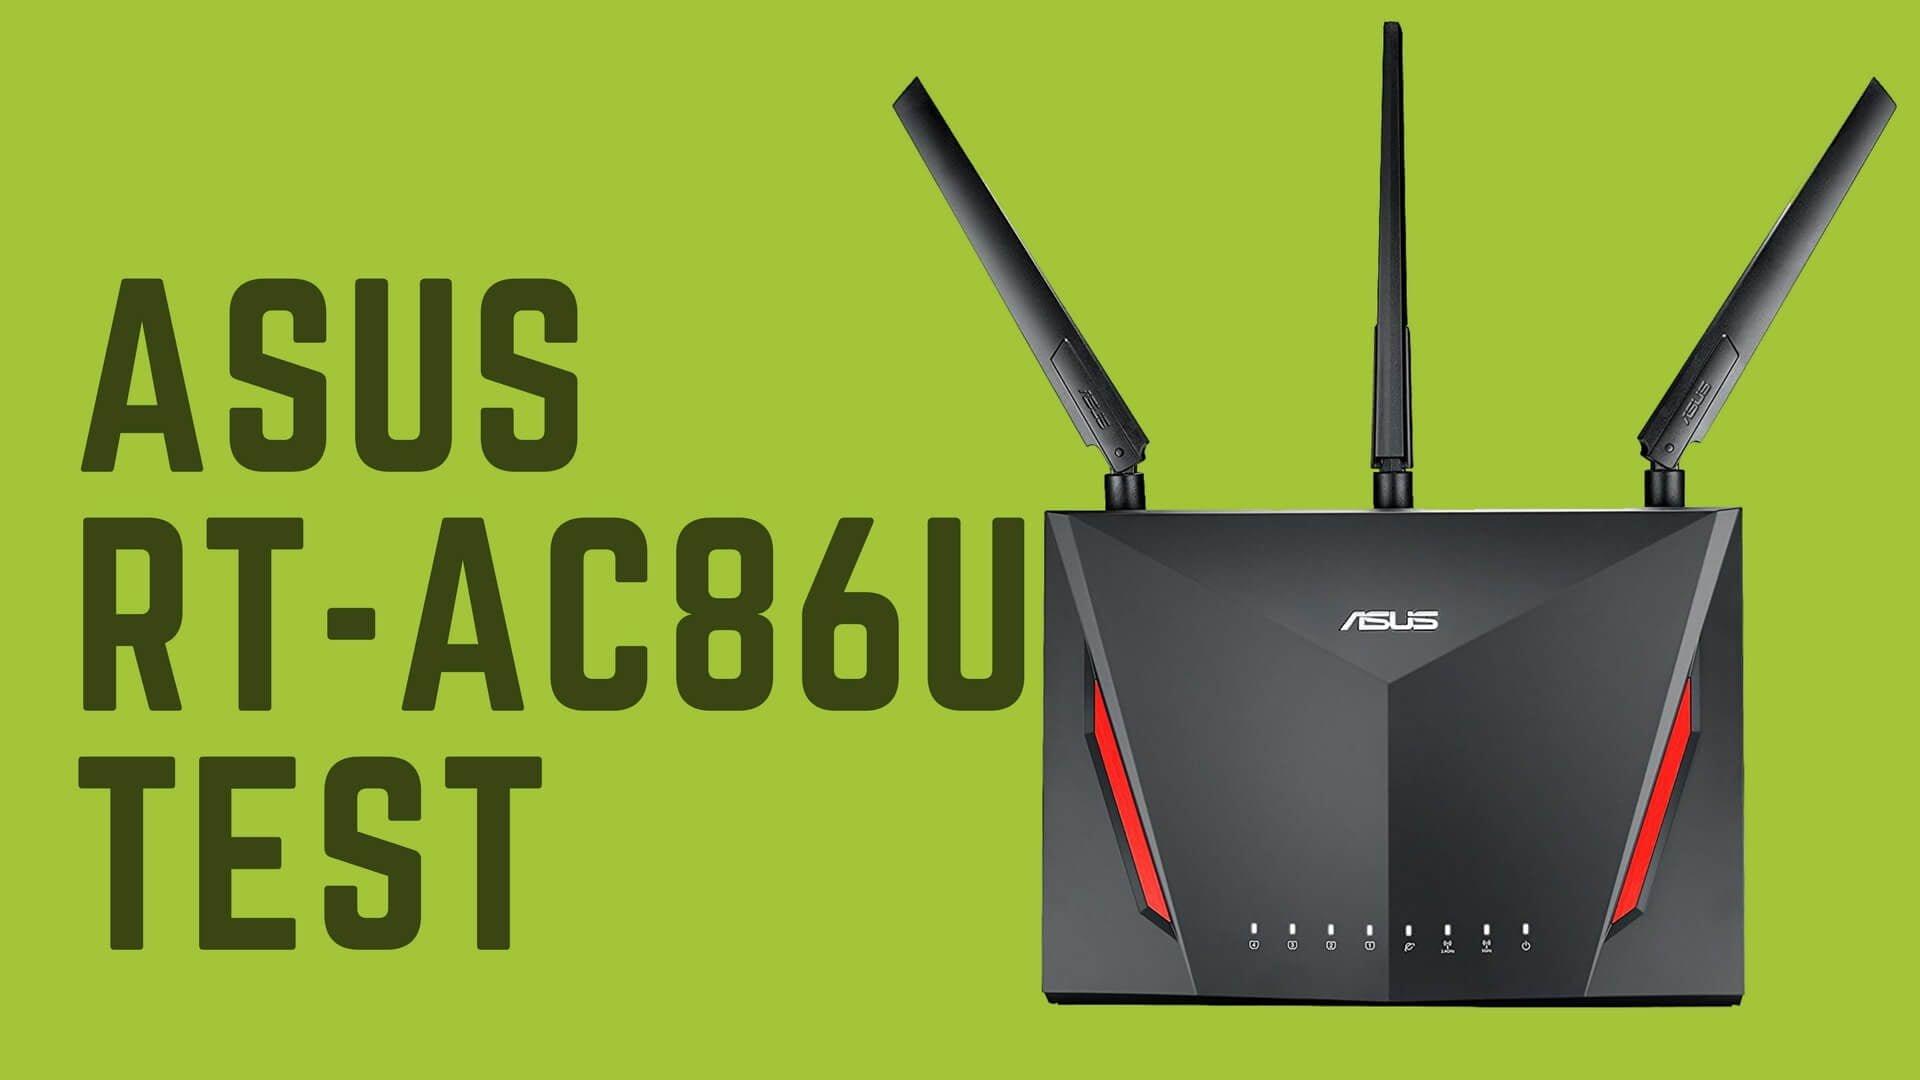 Asus RT-AC86U Test